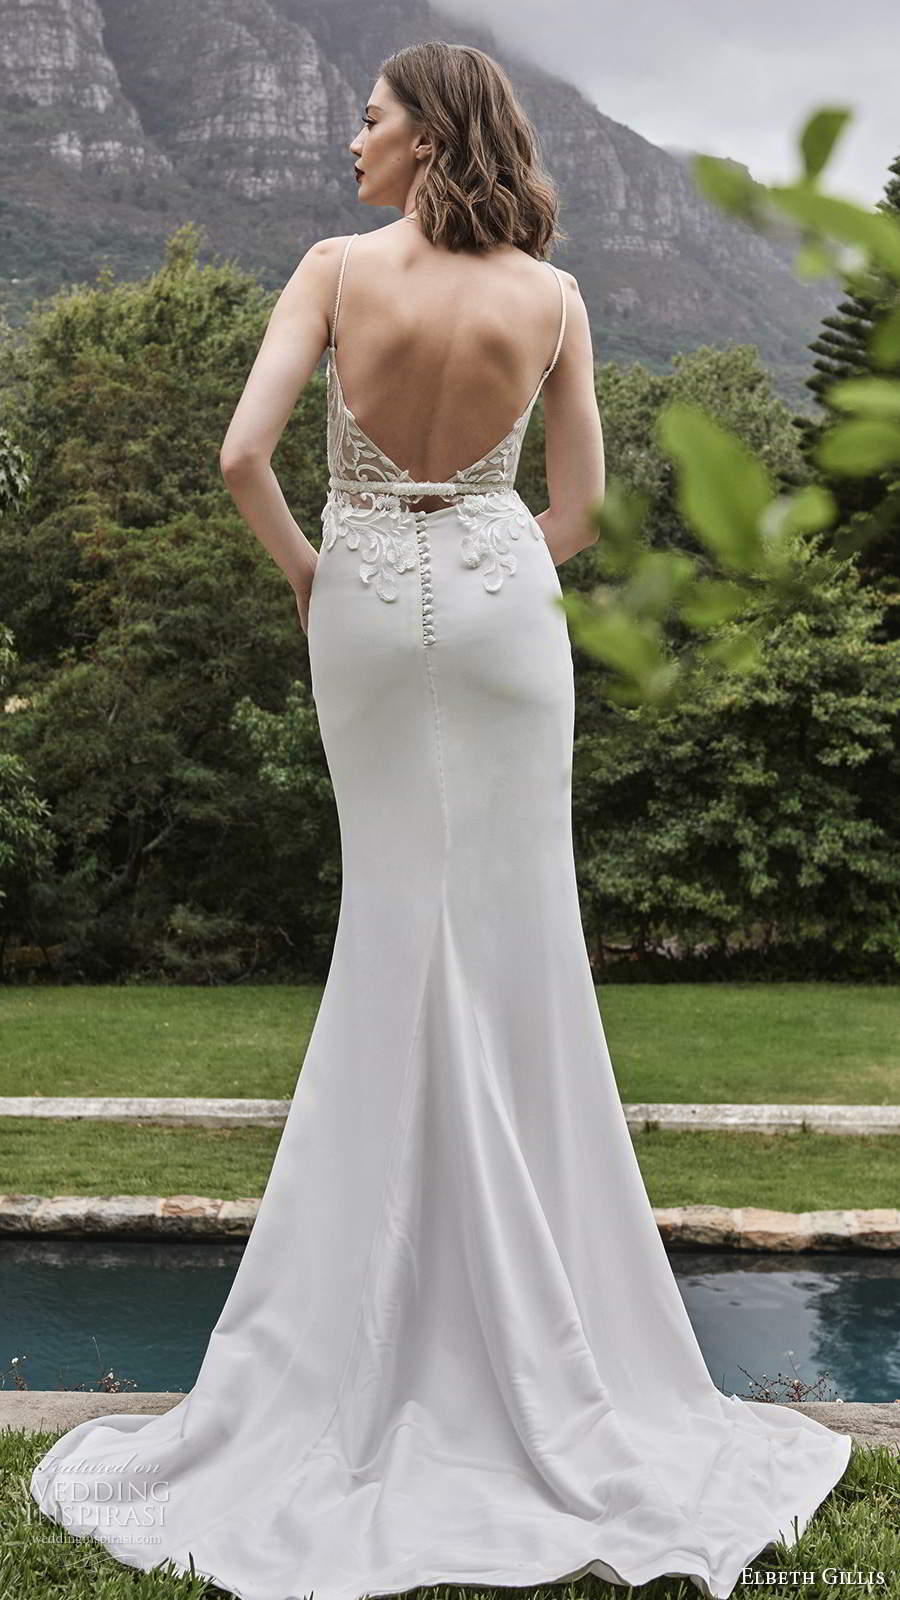 elbeth gillis 2021 bridal sleeveless straps sweetheart neckline embellished bodice clean skirt sheath wedding dress v back chapel train (17) bv